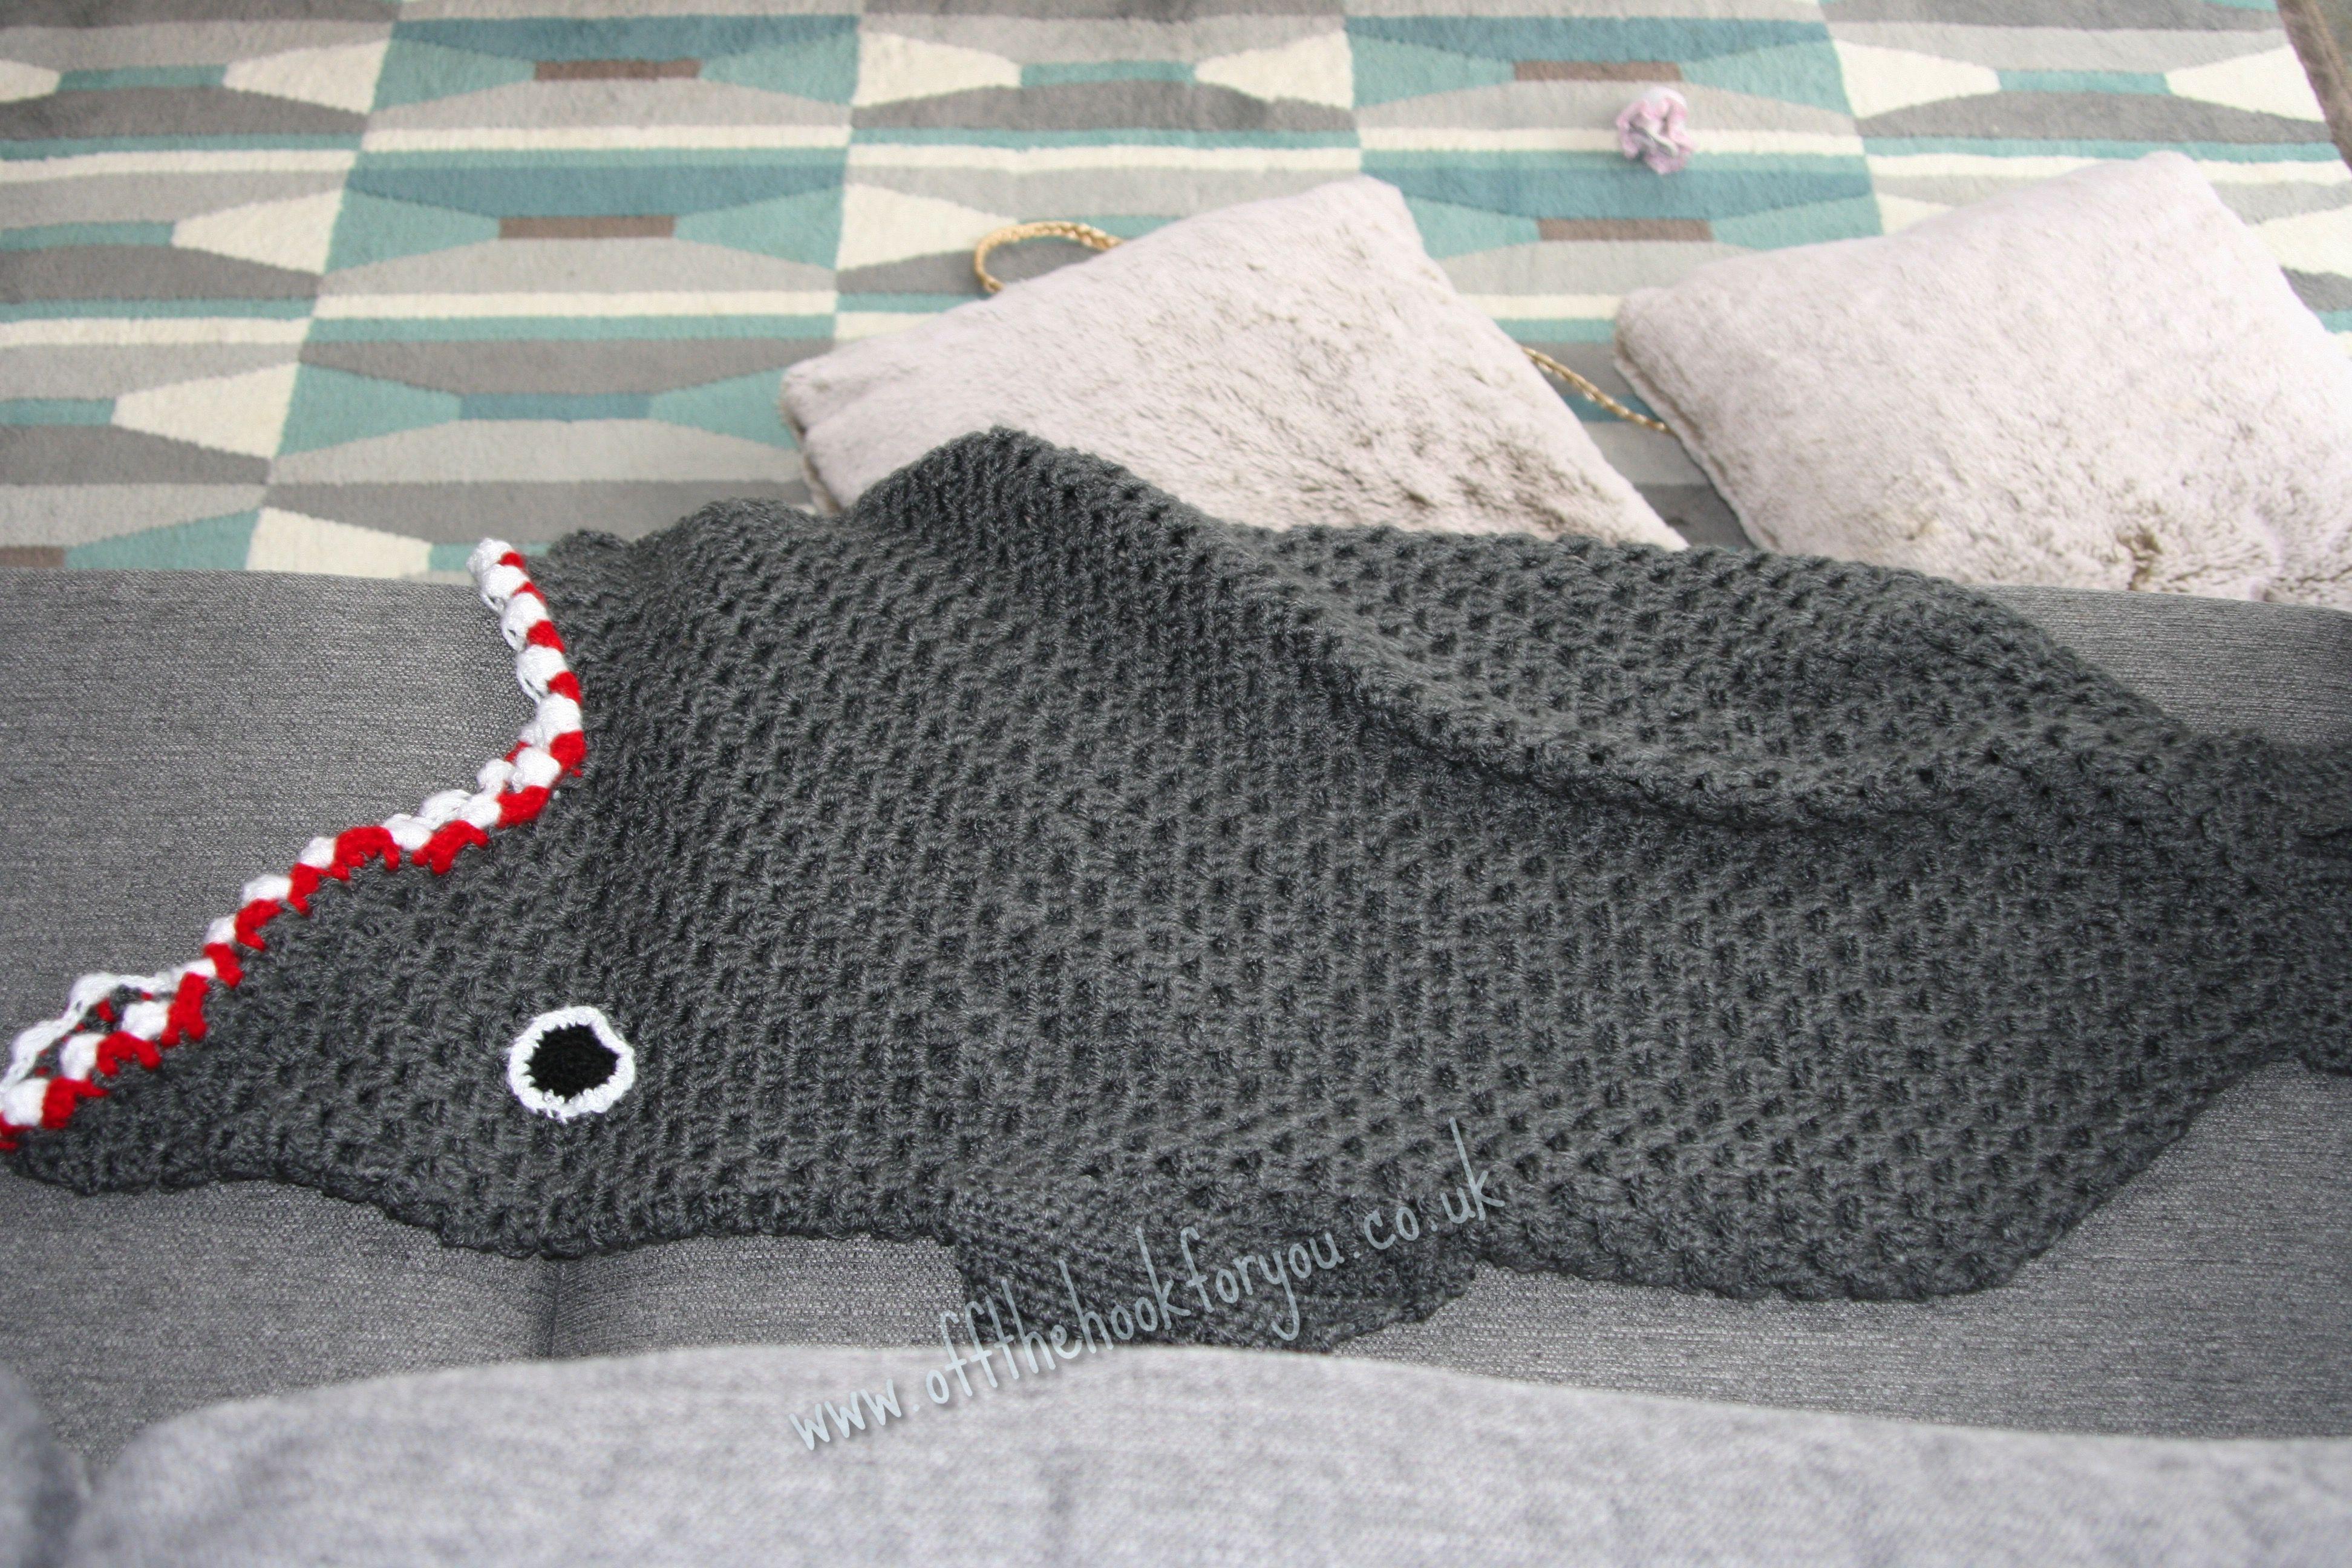 Eaten by a Shark - The pattern from offthehookforyou ...